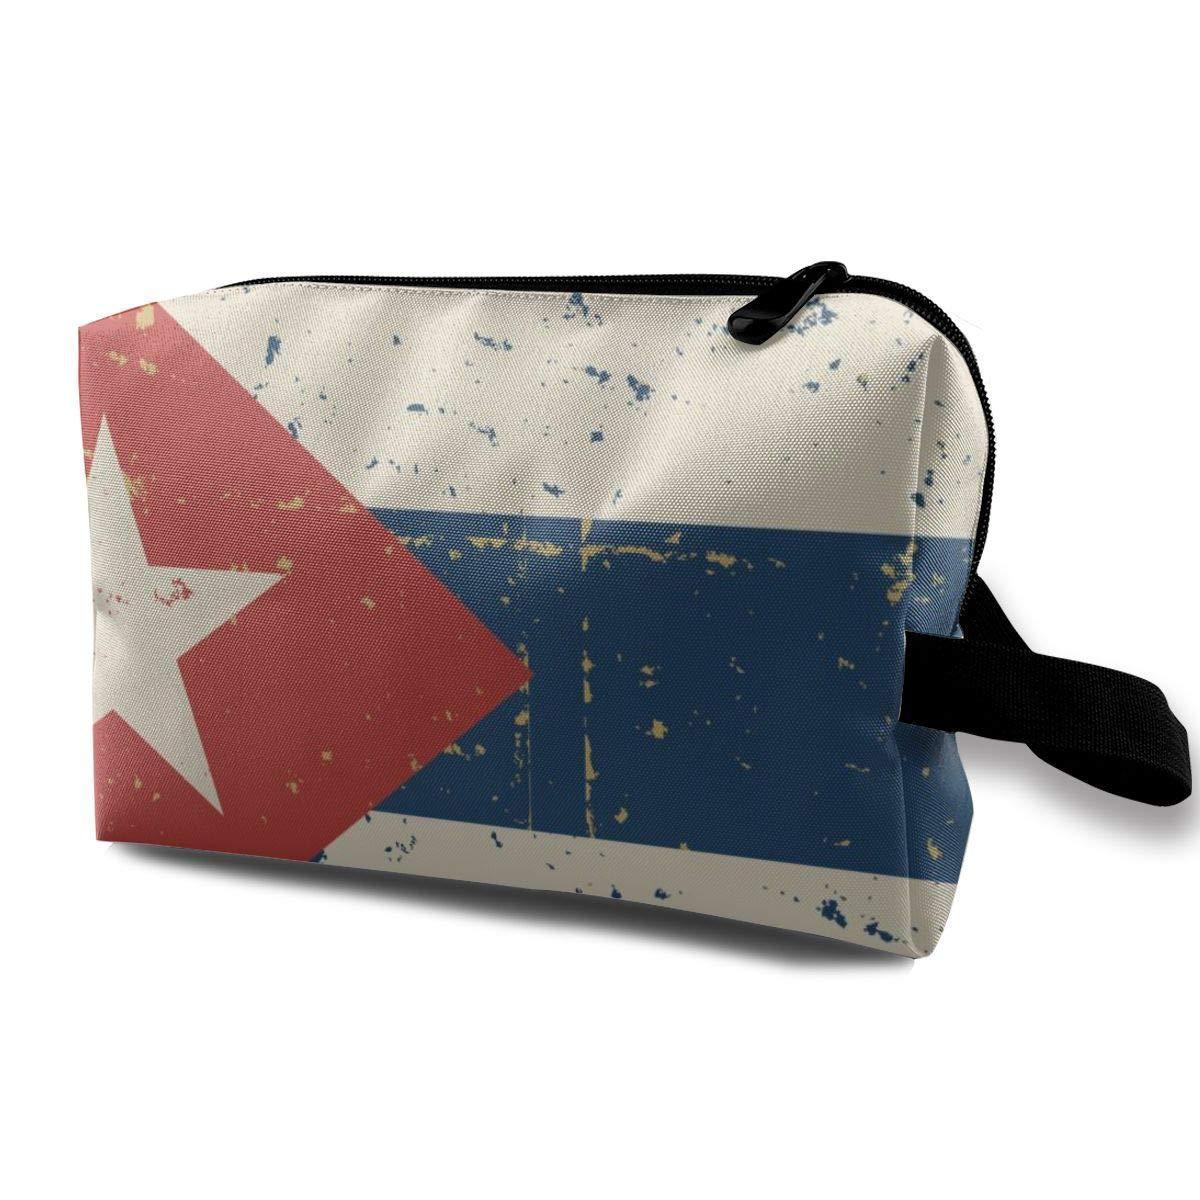 Students Super Large Capacity Canvas Pencil Case Pen Bag Pouch Stationary Case Makeup Cosmetic Bag (Retro Cuban Flag)